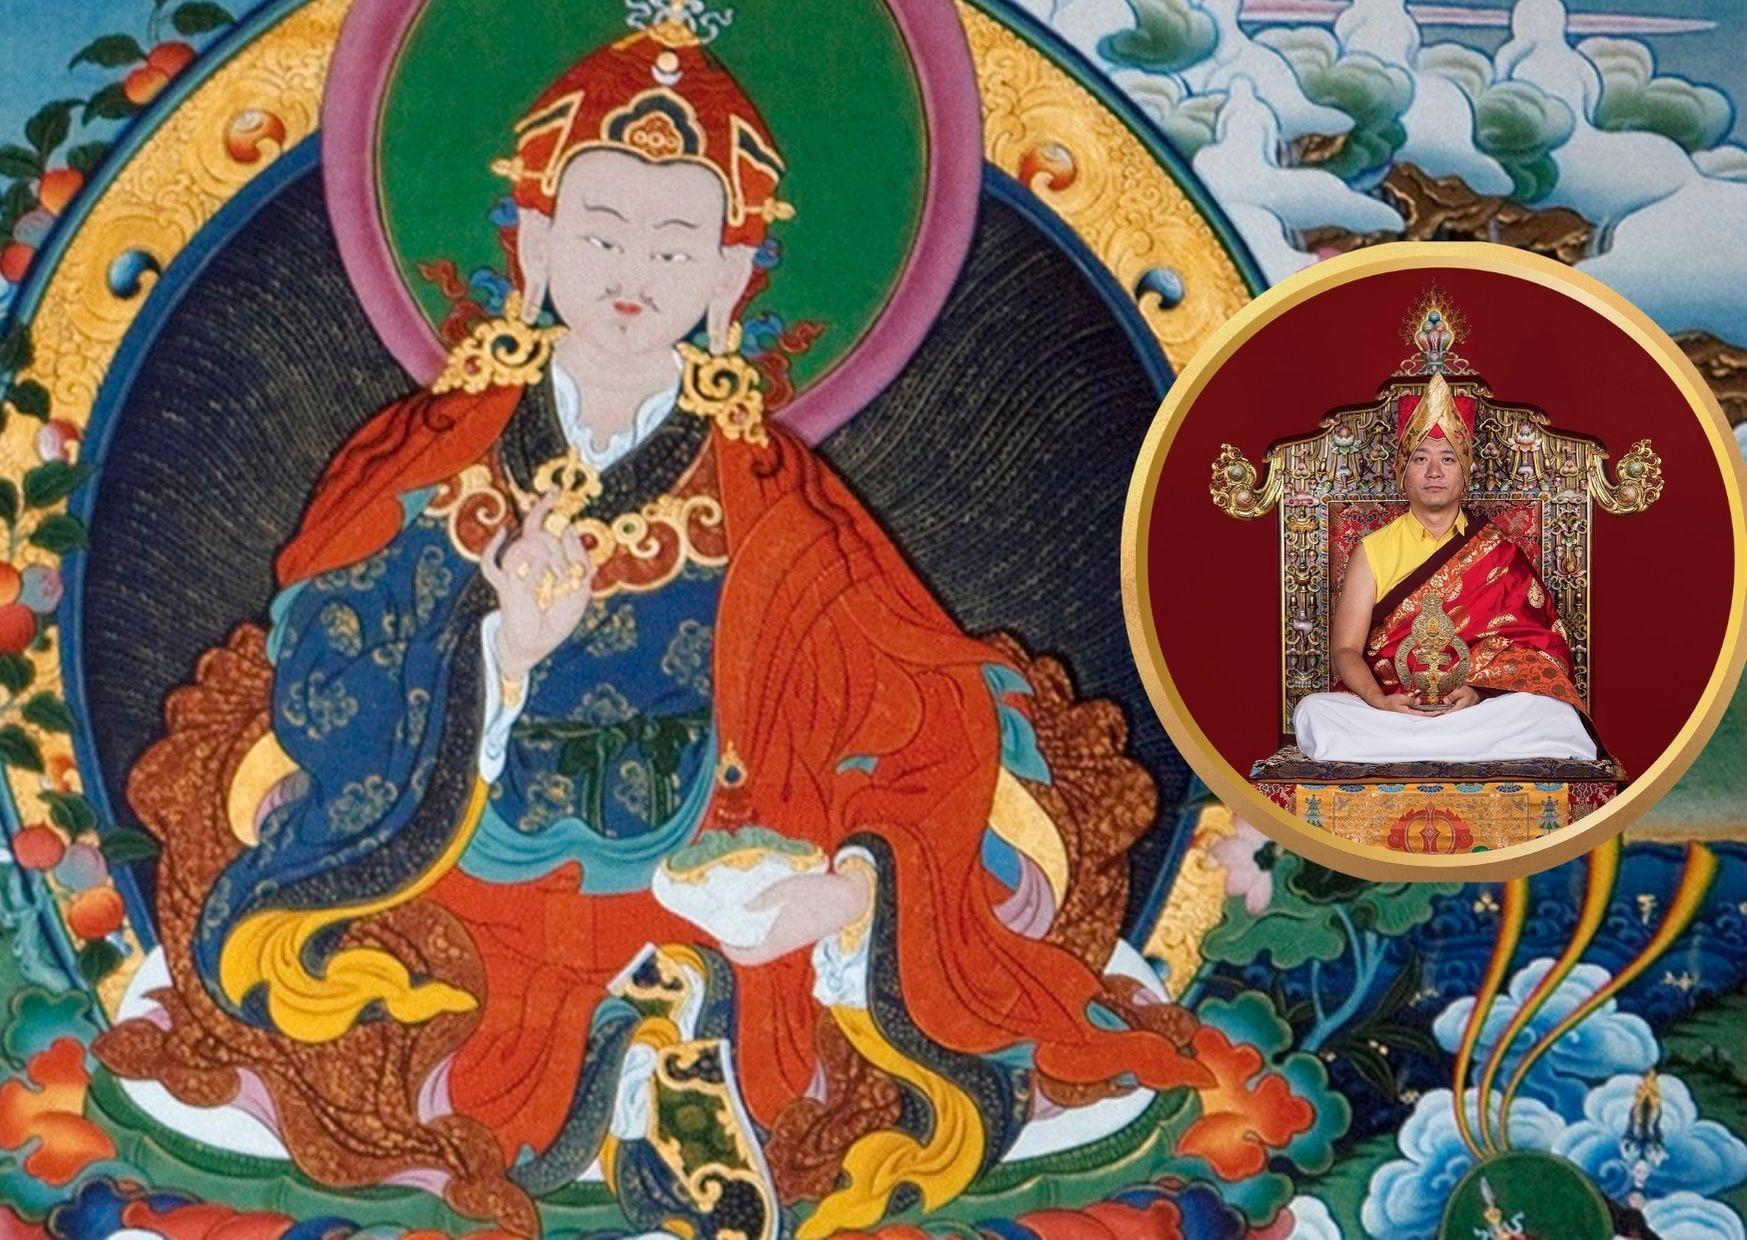 GURU RINPOCHE TEACHINGS AND INITIATION- H.E. Gyana Vajra Rinpoche